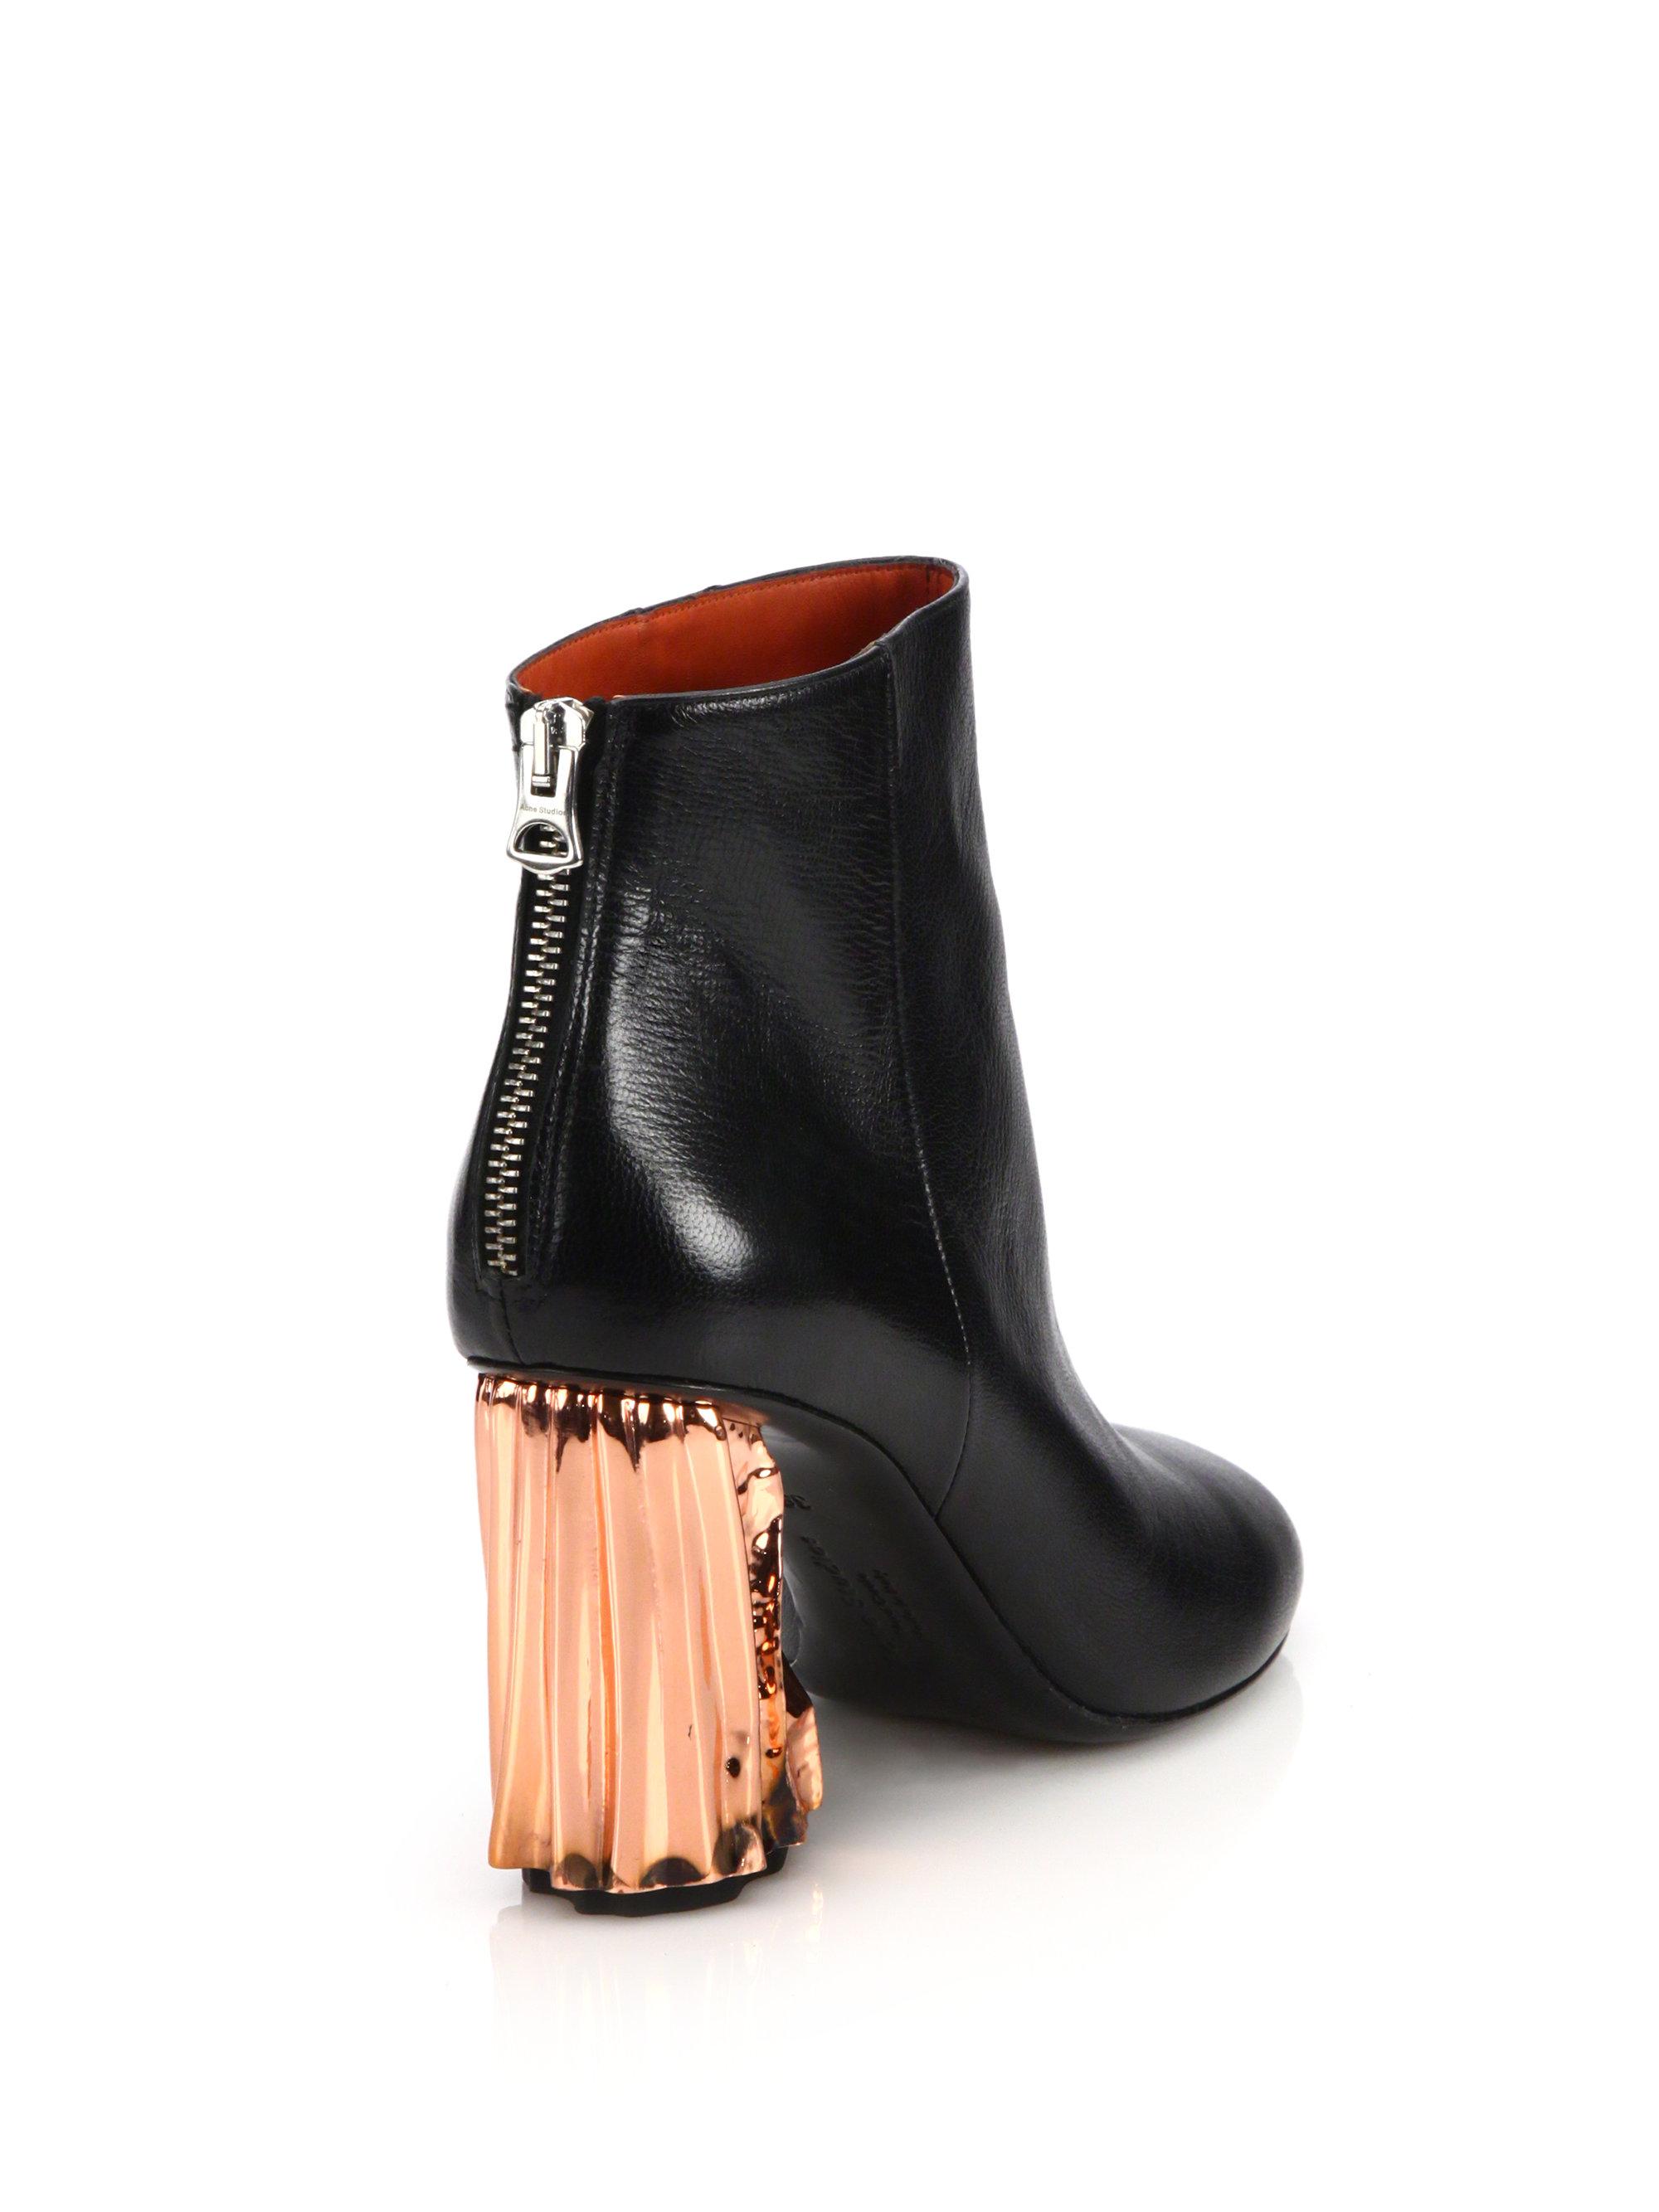 aa16a4a48da Lyst - Acne Studios Ora Palm Leather Metal-heel Booties in Black